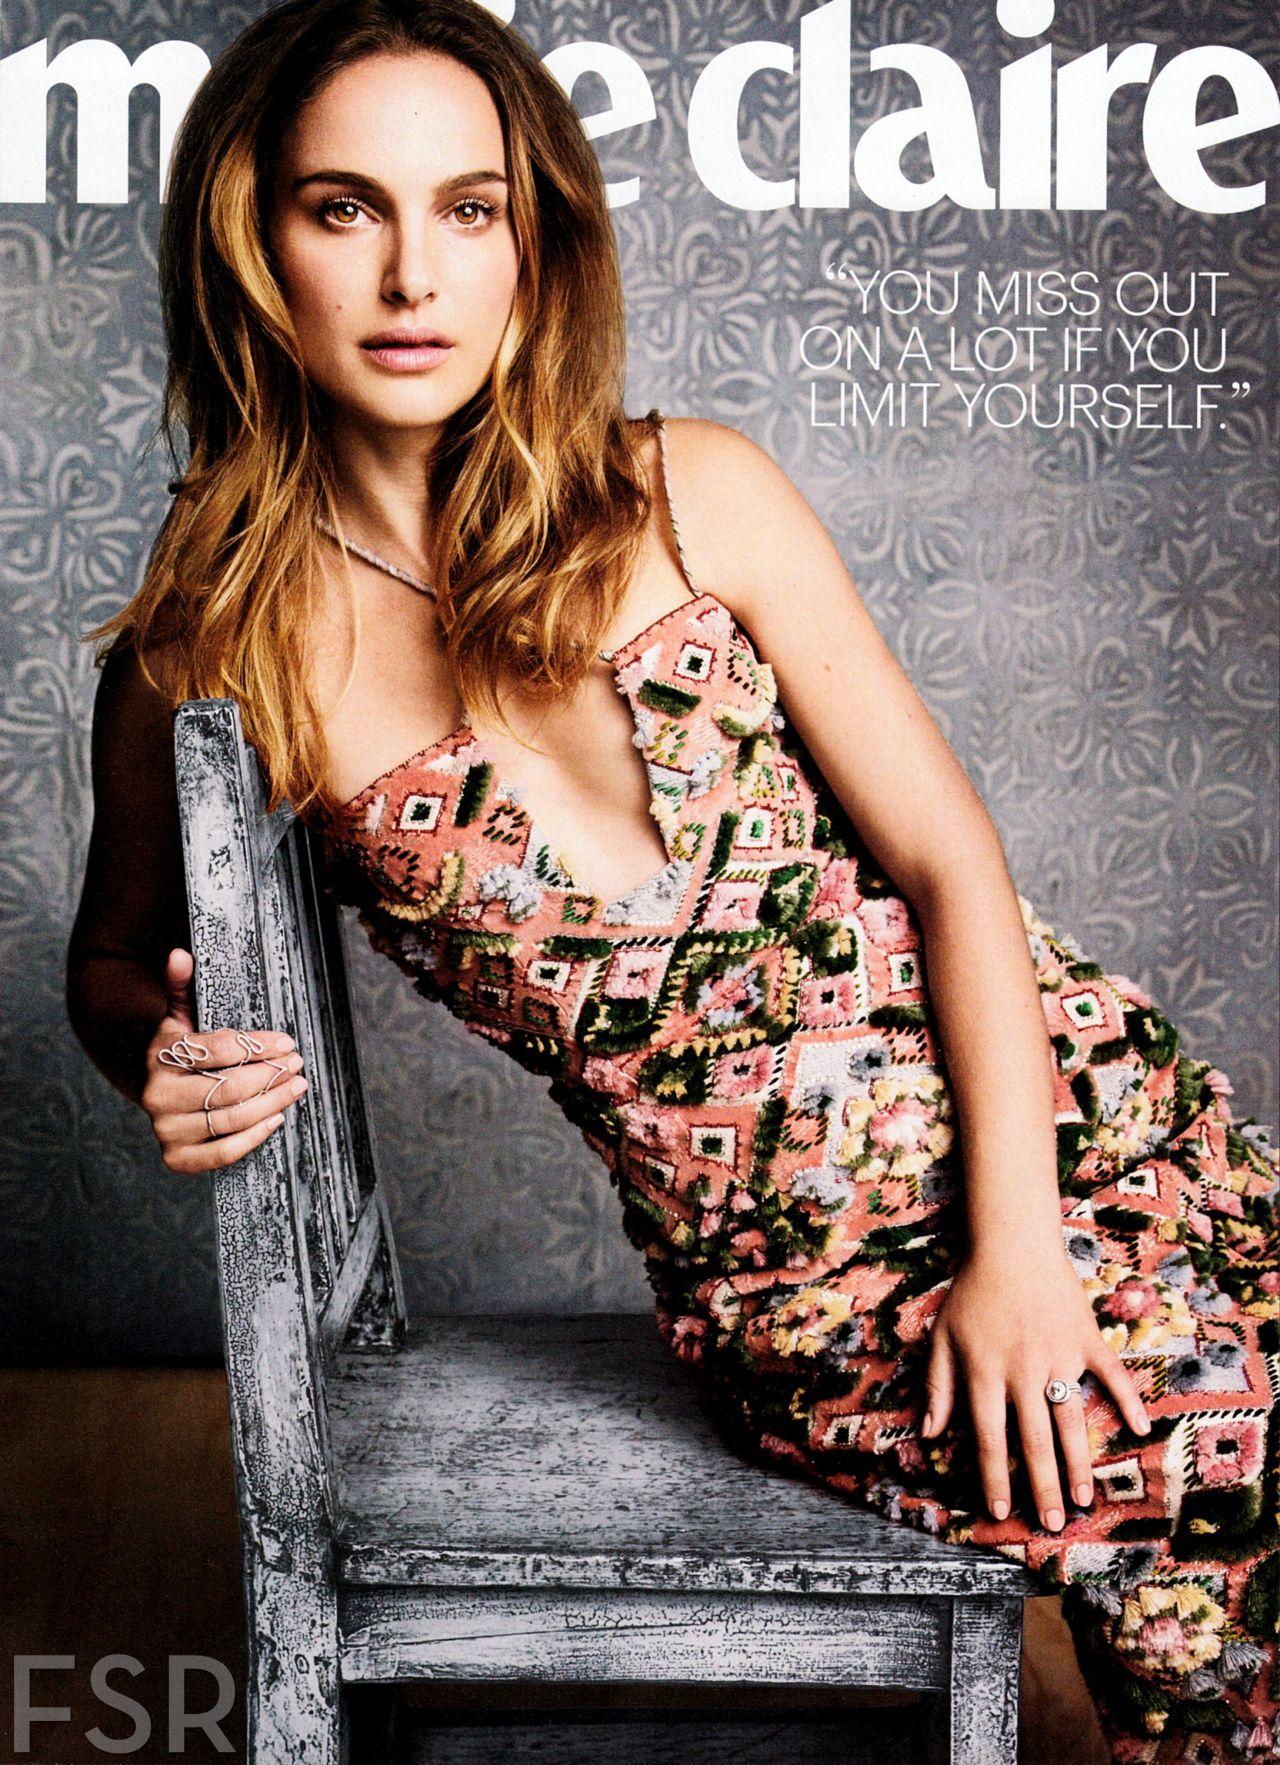 Natalie Portman in Marie Claire Magazine November 2013 Issue